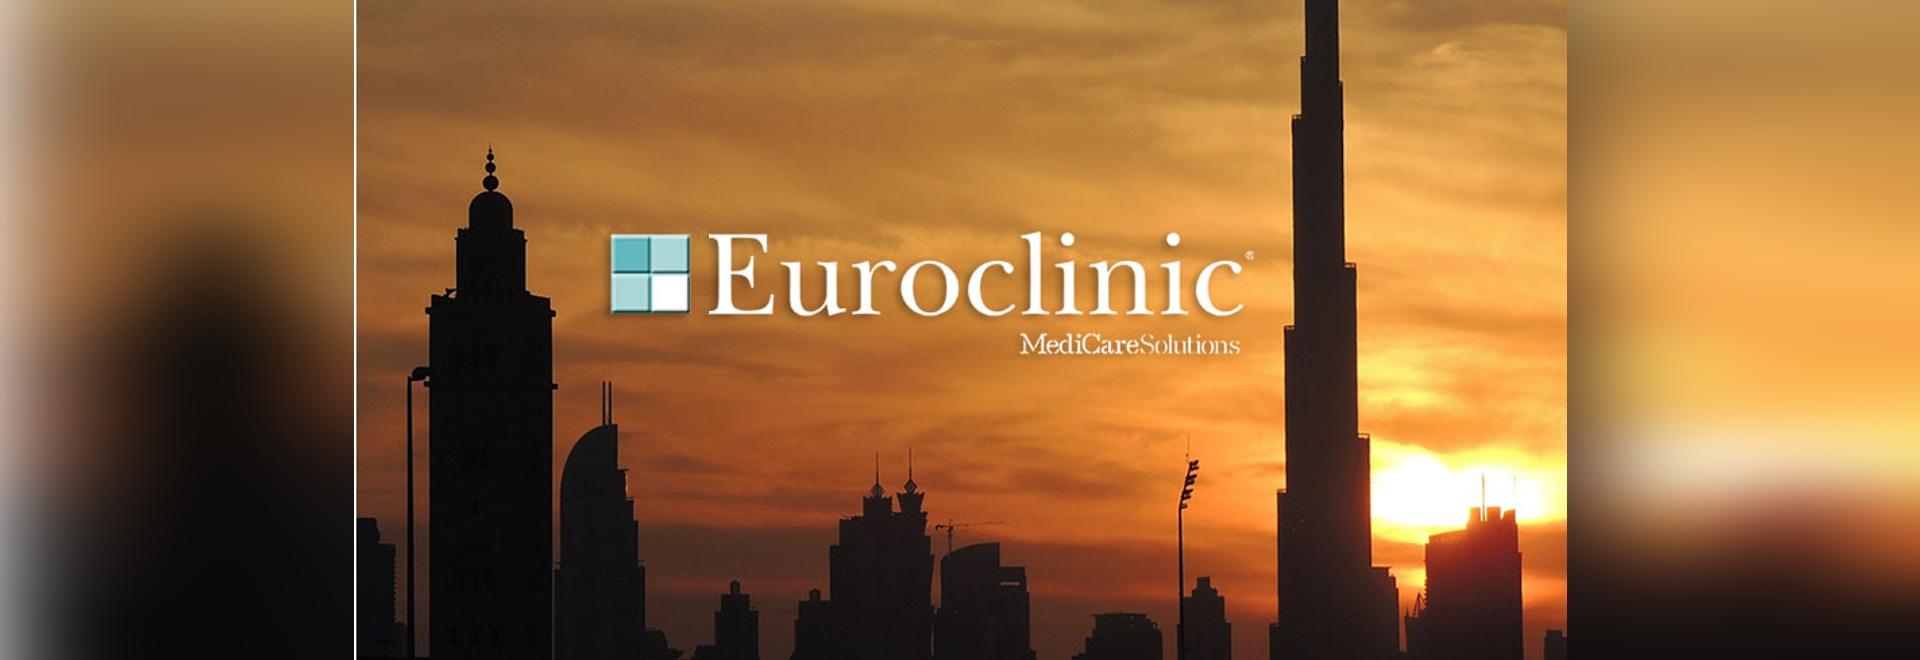 Euroclinic at Arab Health